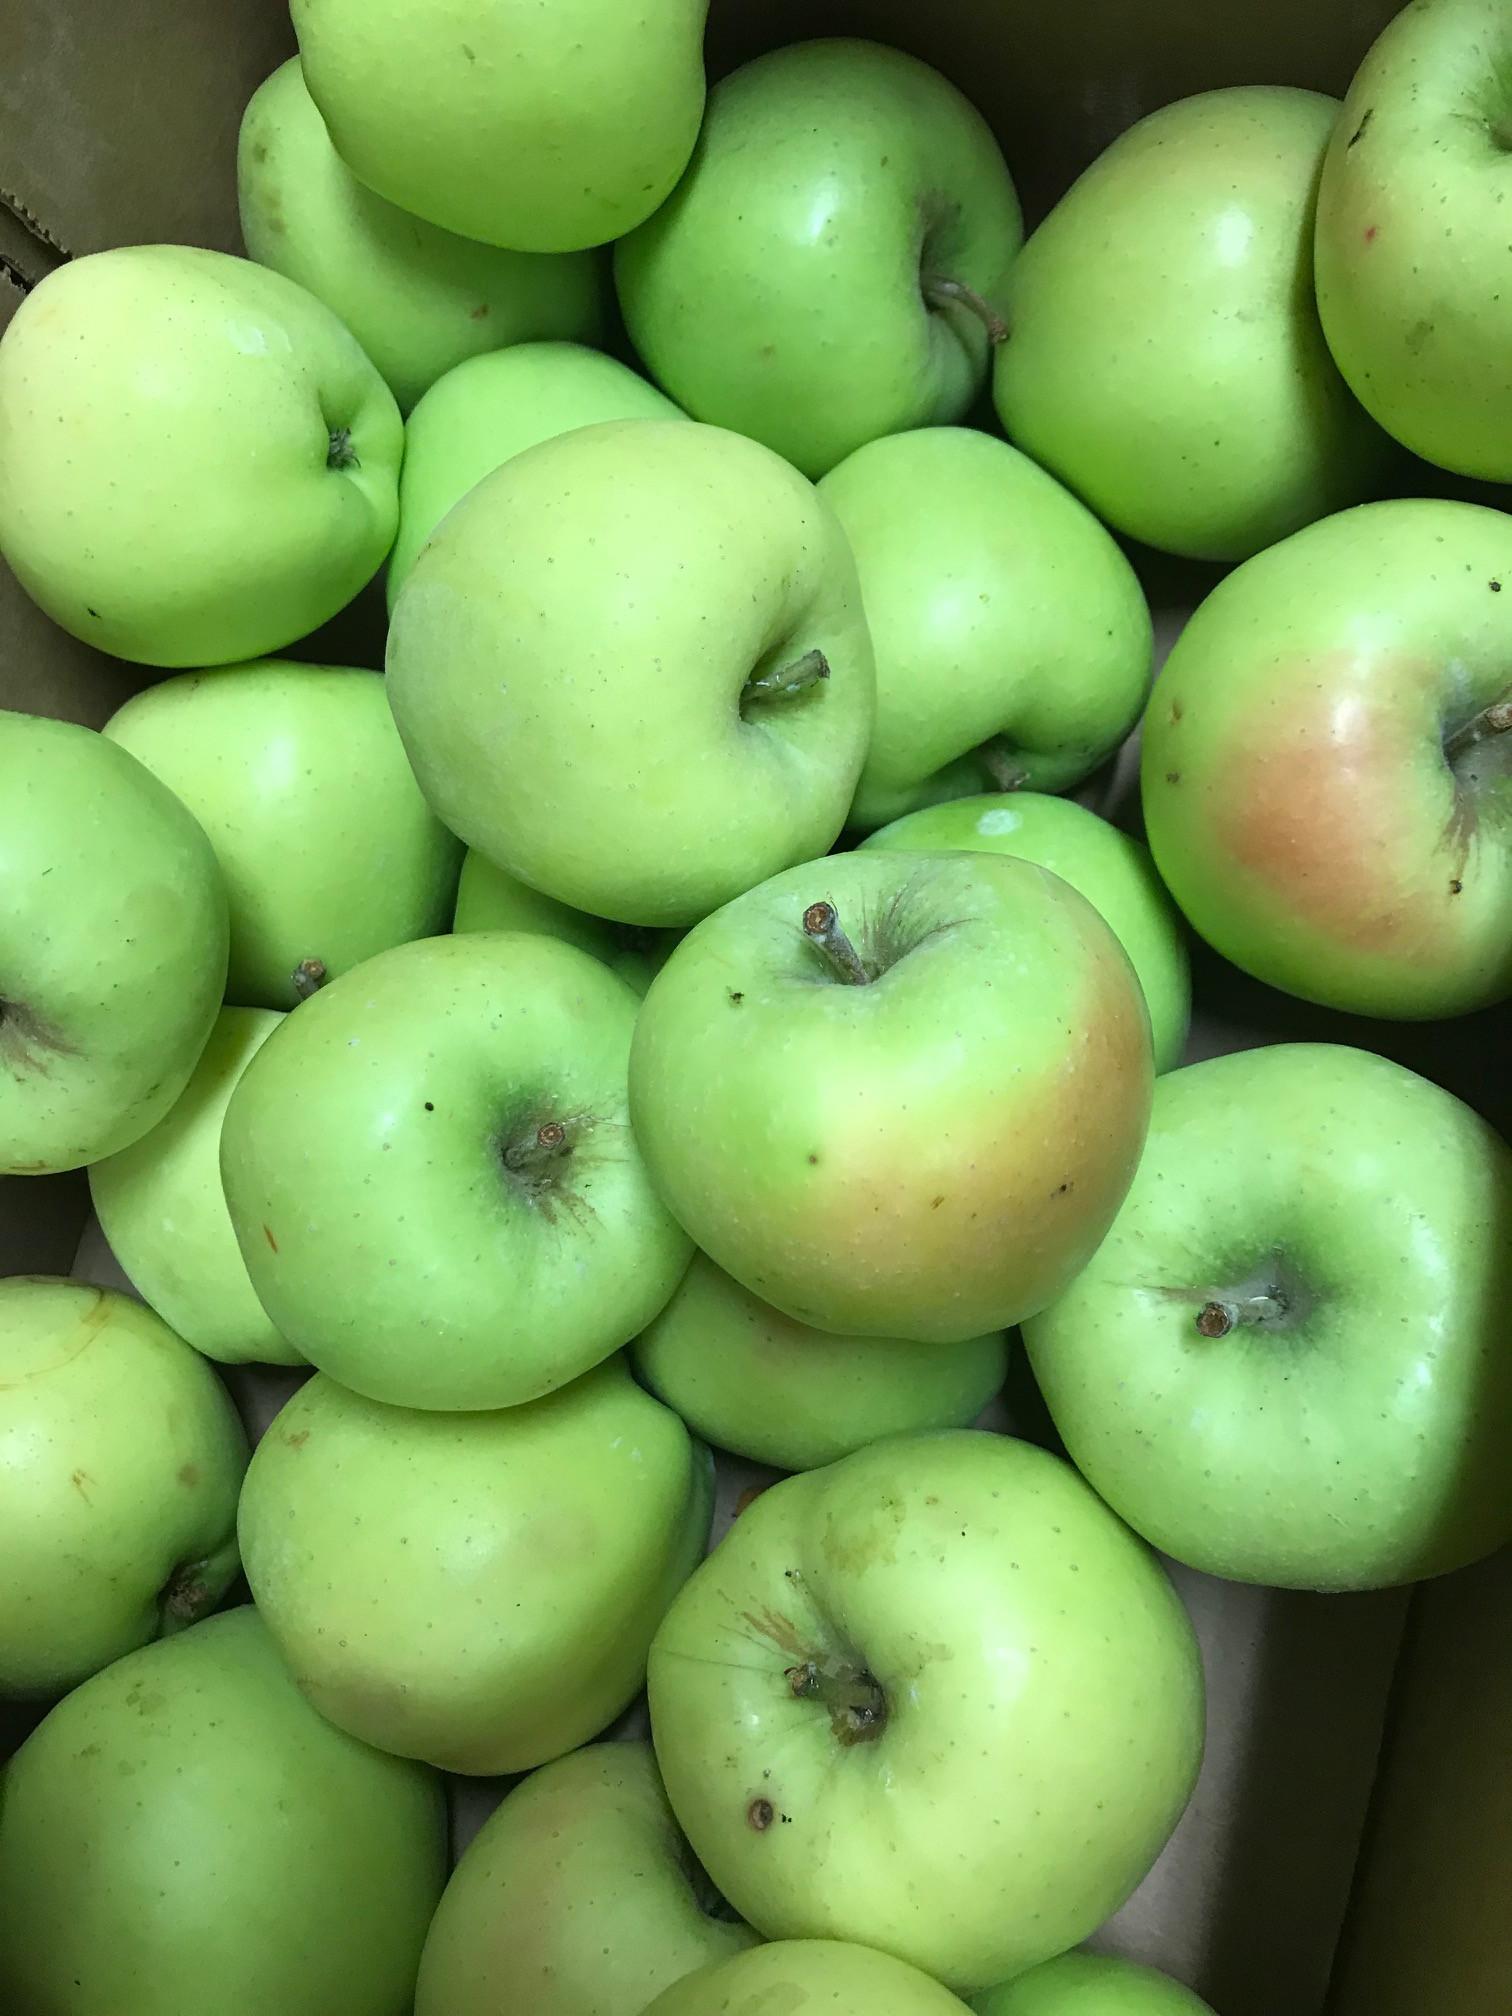 Apples, Criterion